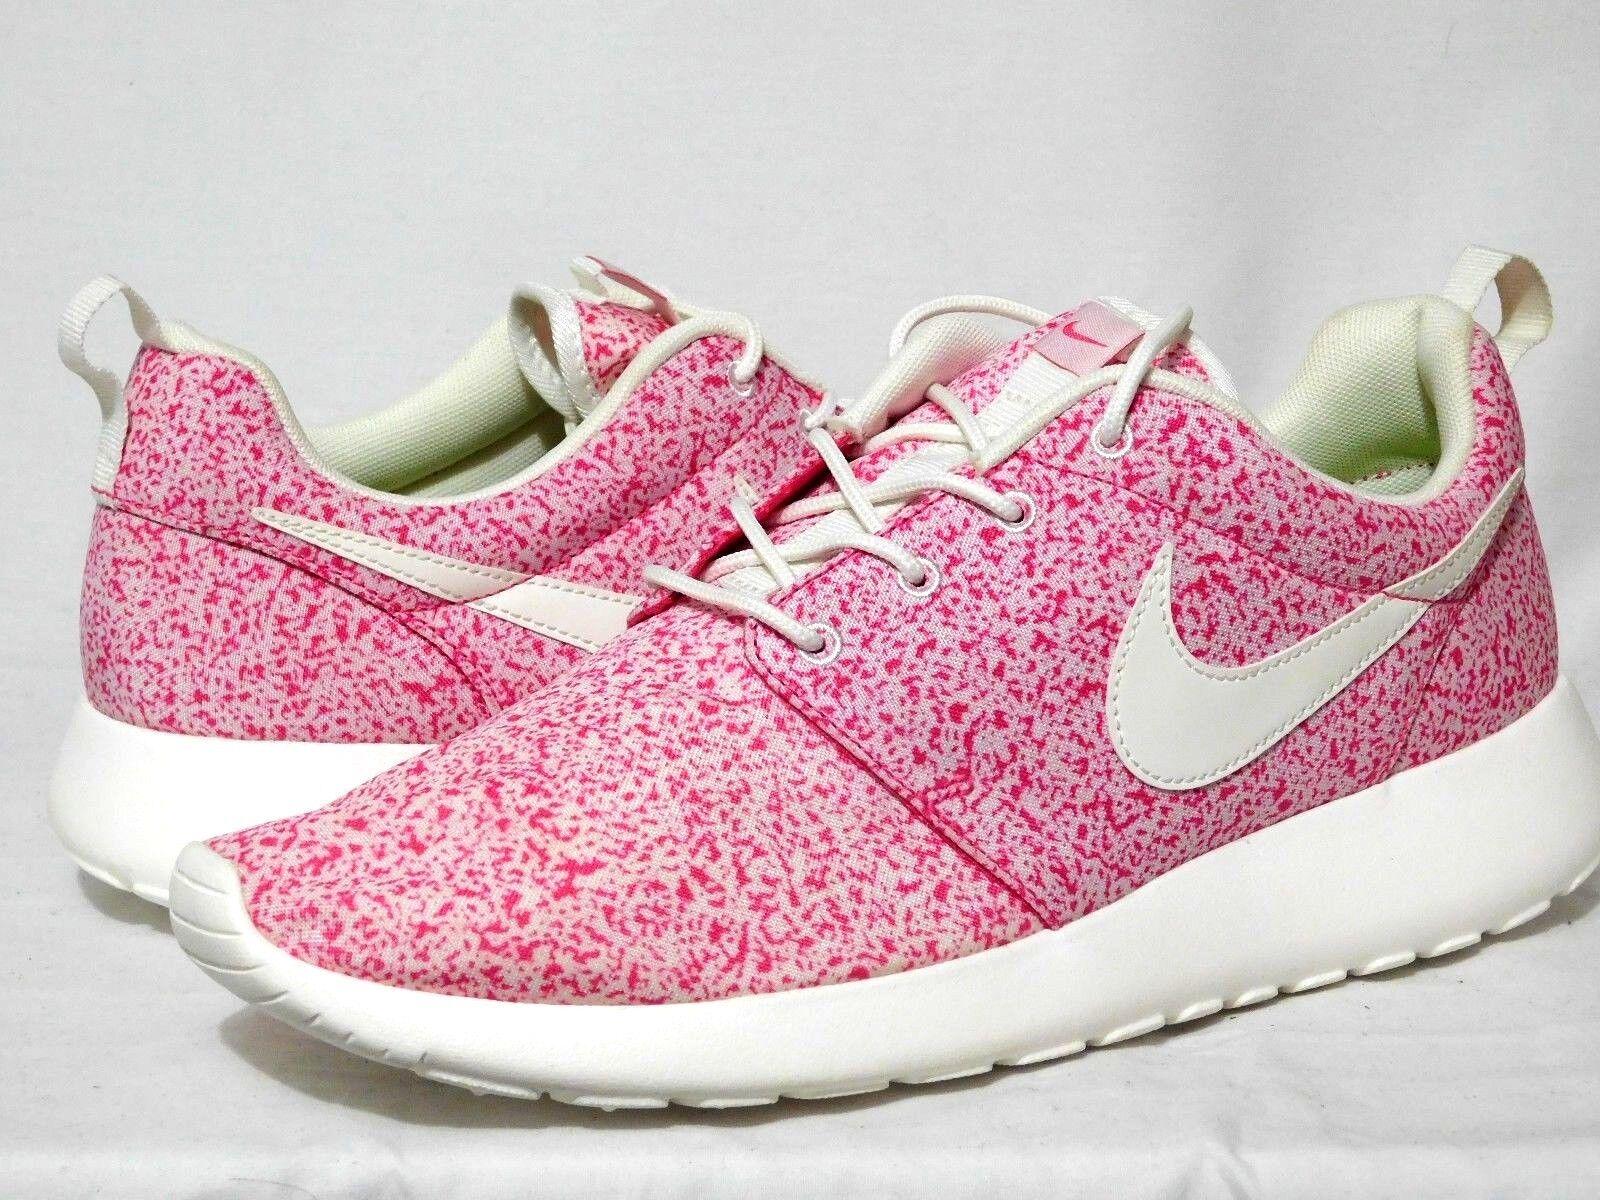 Nike Rosherun Rosherun Nike Vela Rosa Force 511882 101 para mujer hombres 9.5 WMMS 8cd524